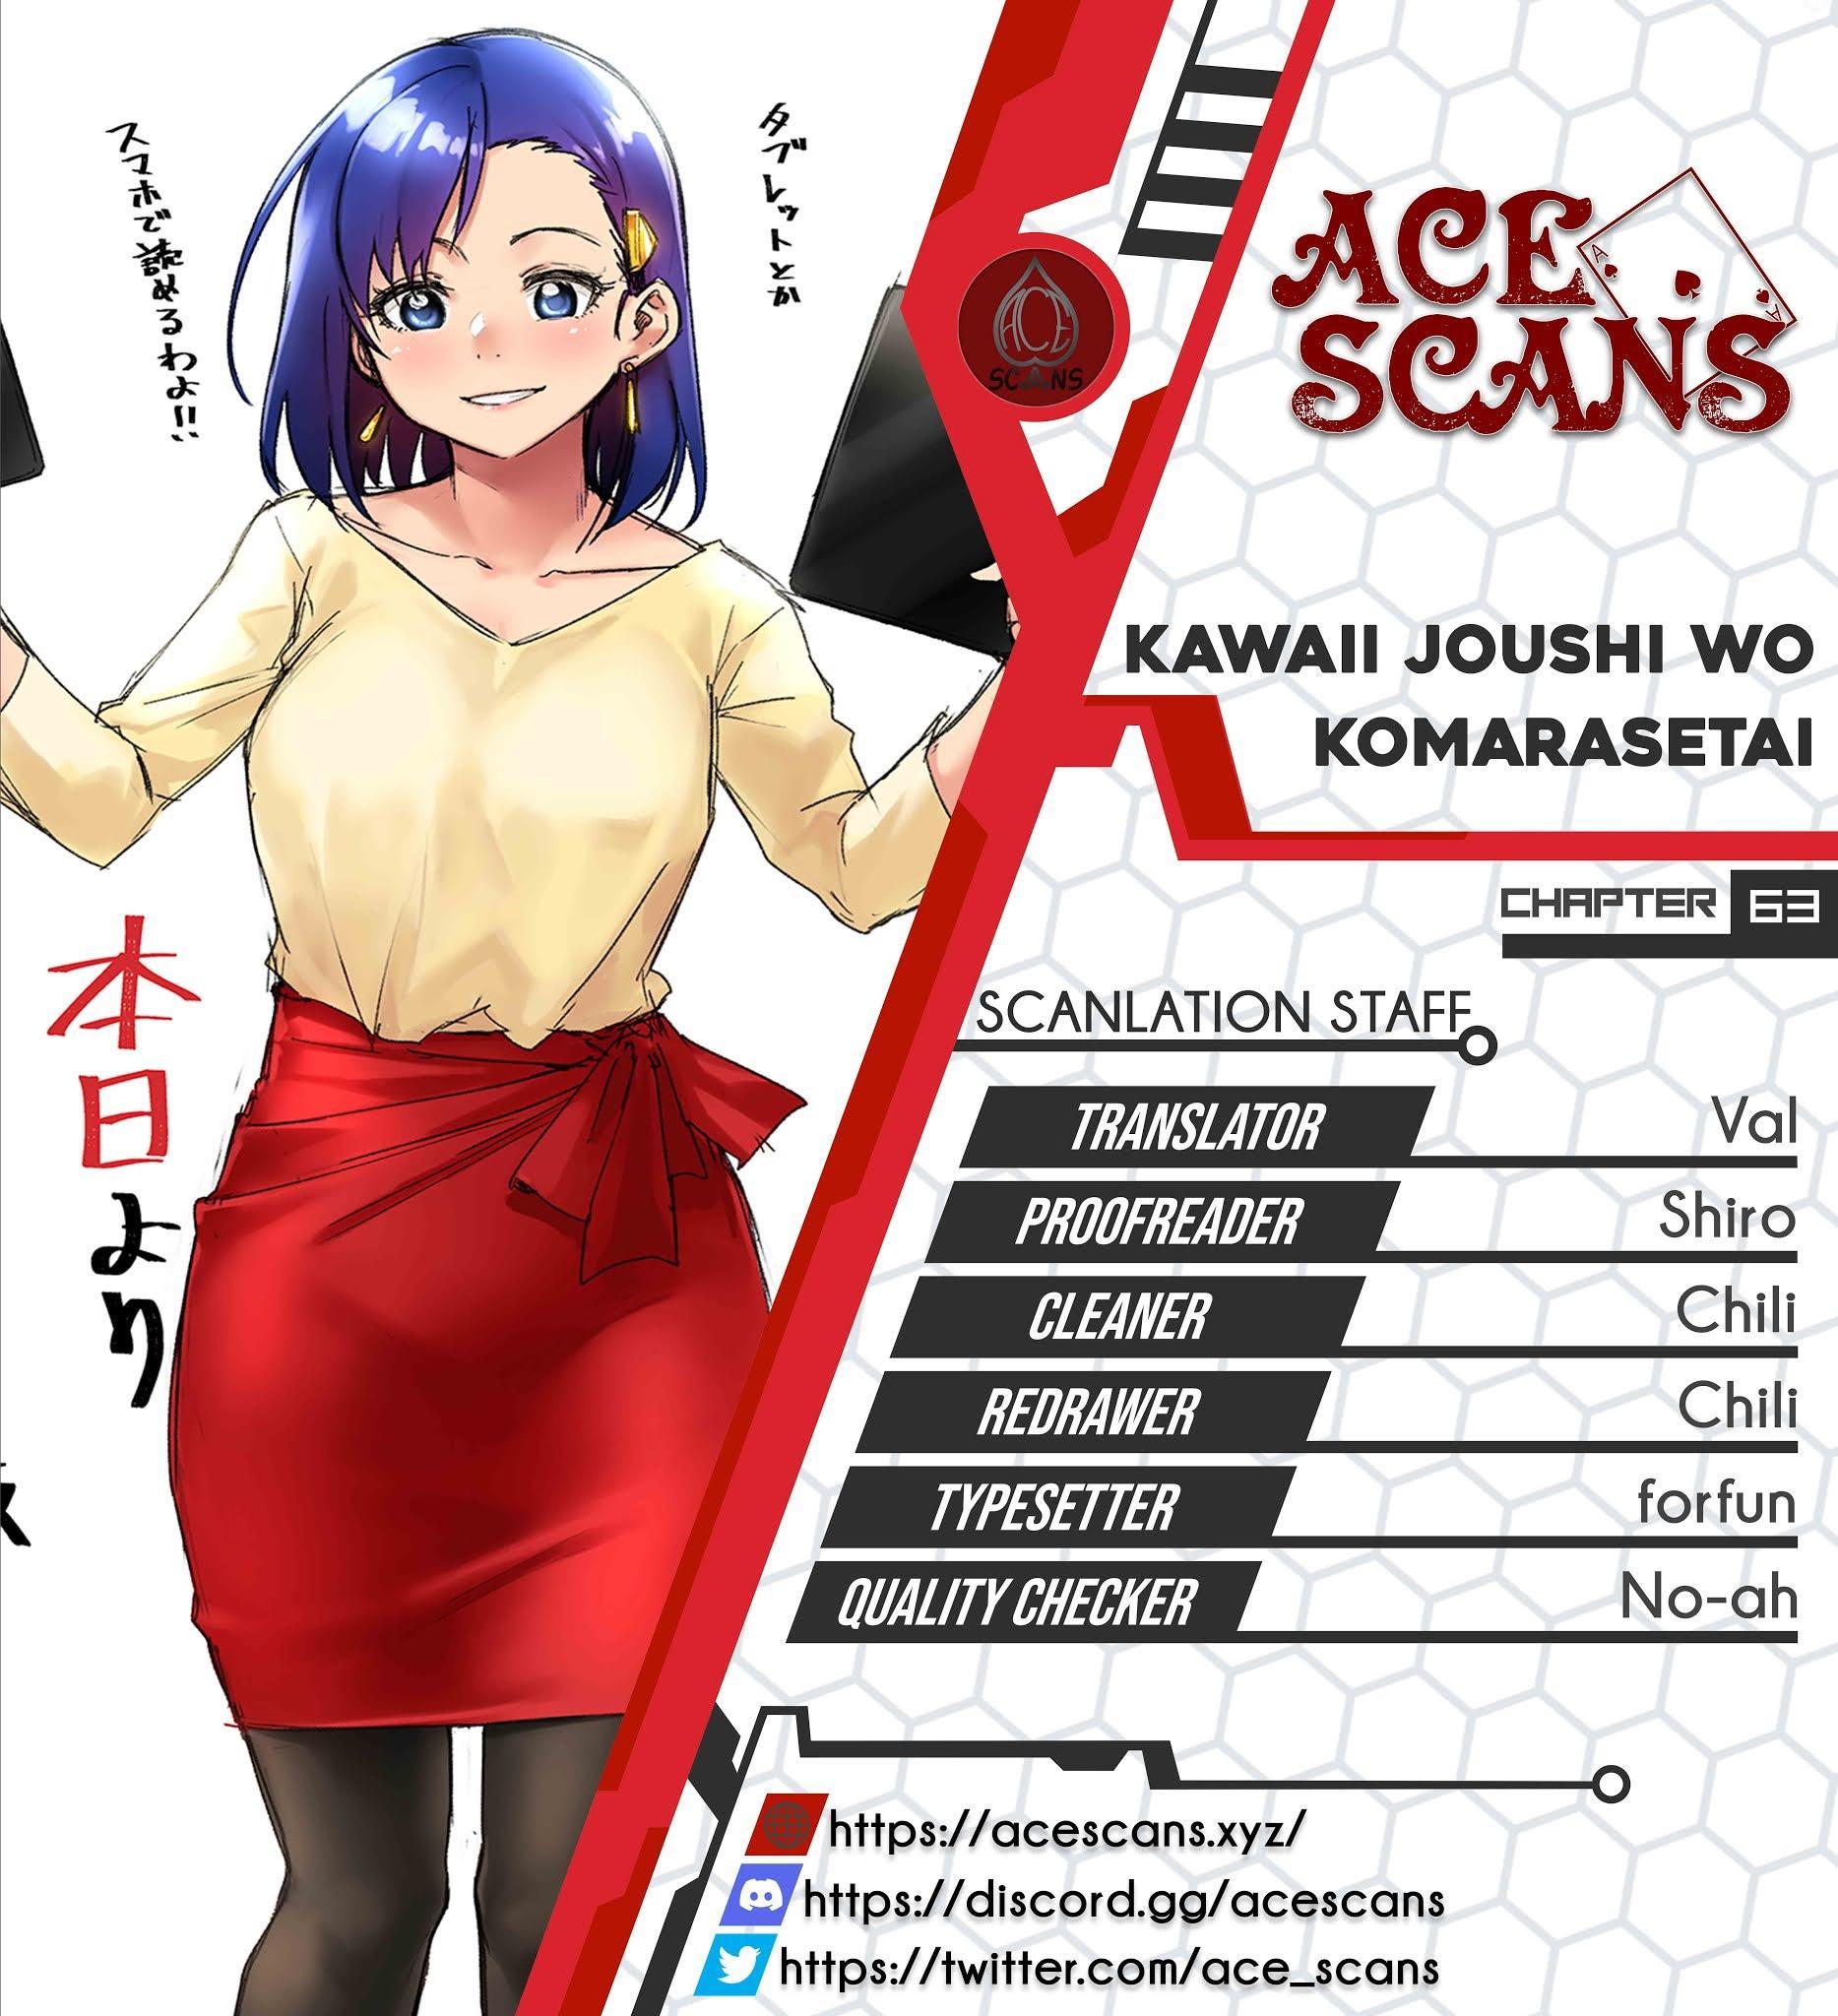 Kawaii Joushi O Komarasetai Chapter 63 page 1 - Mangakakalots.com